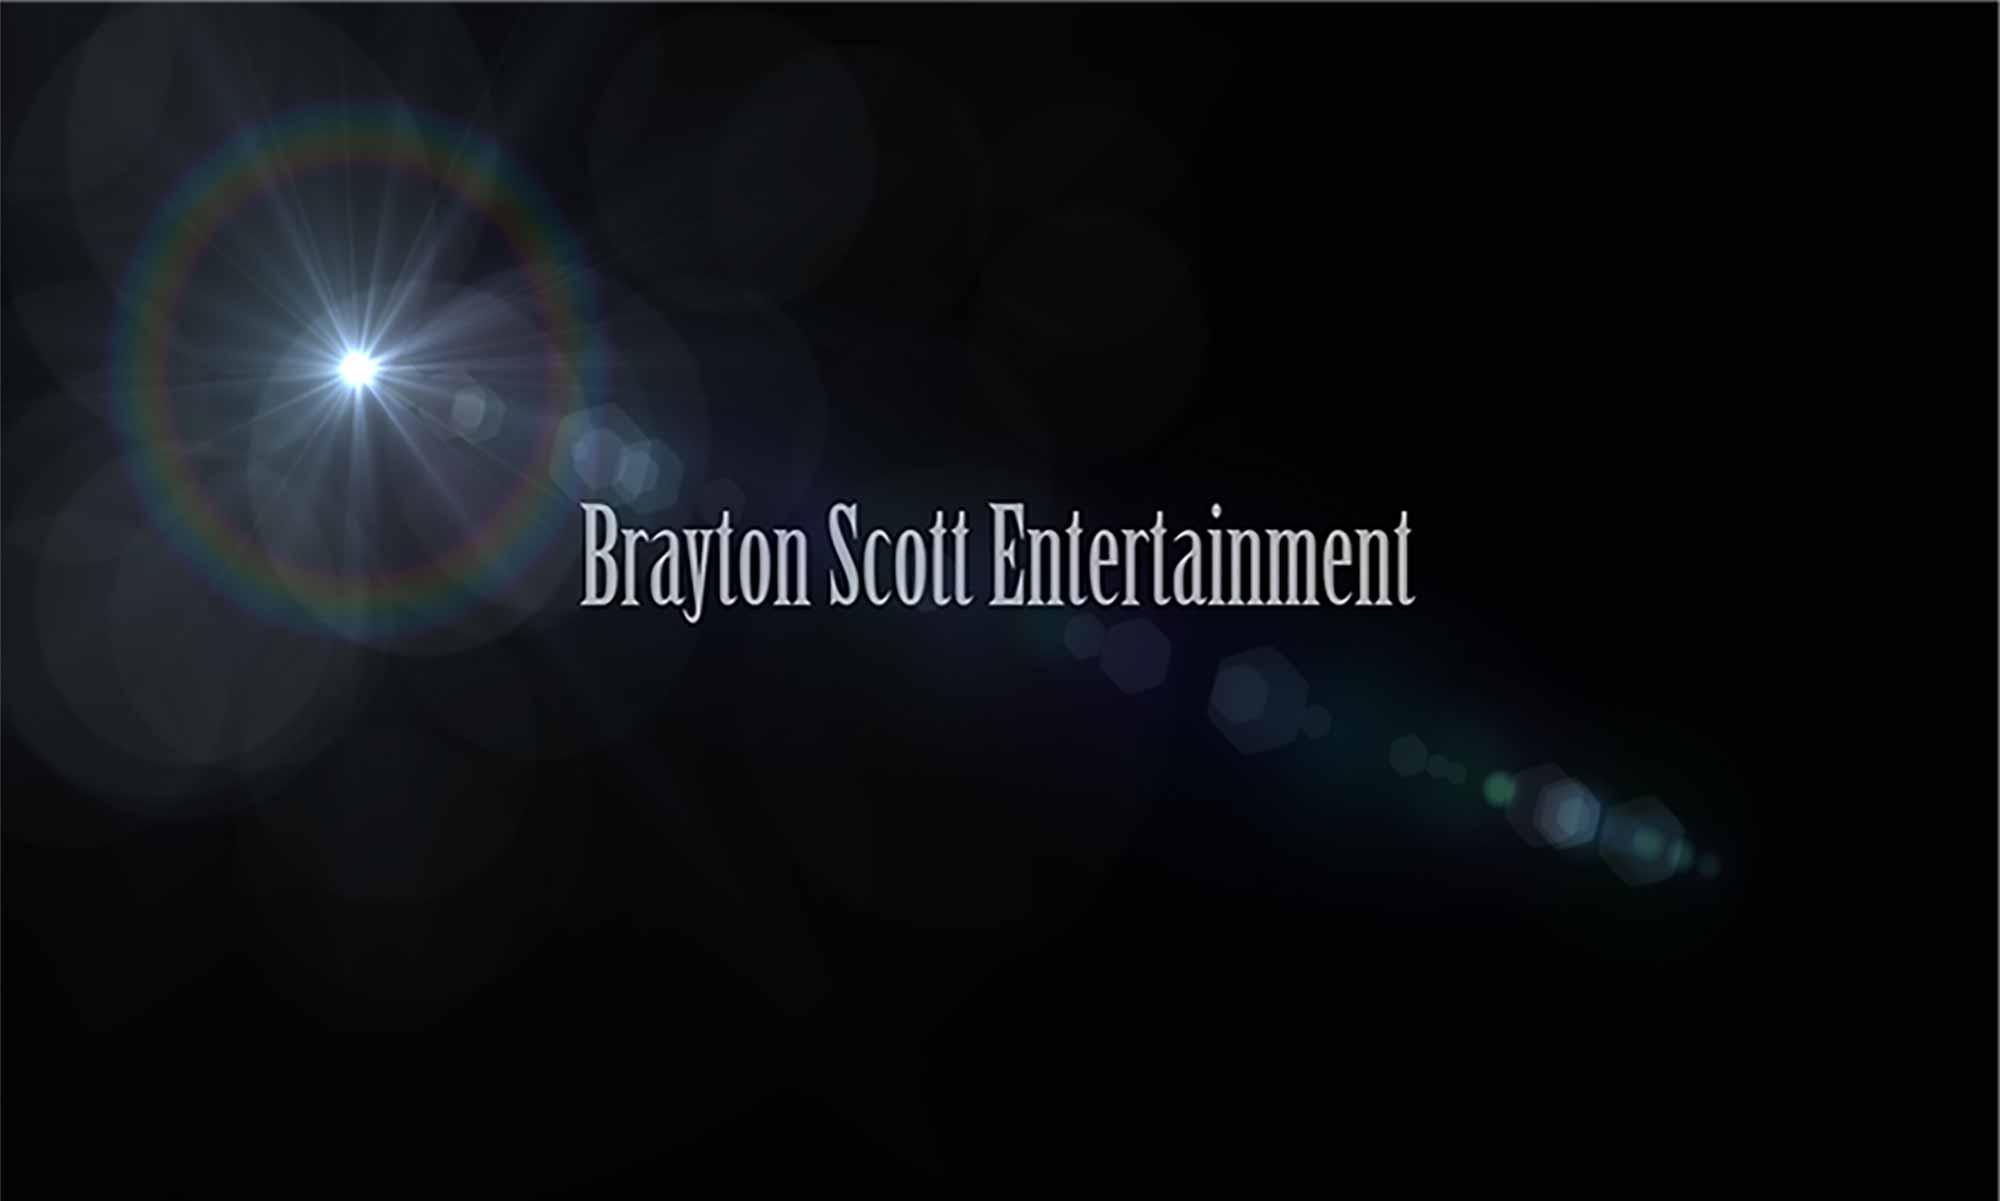 Image of Brayton Scott Entertainment© 21st Century Logo